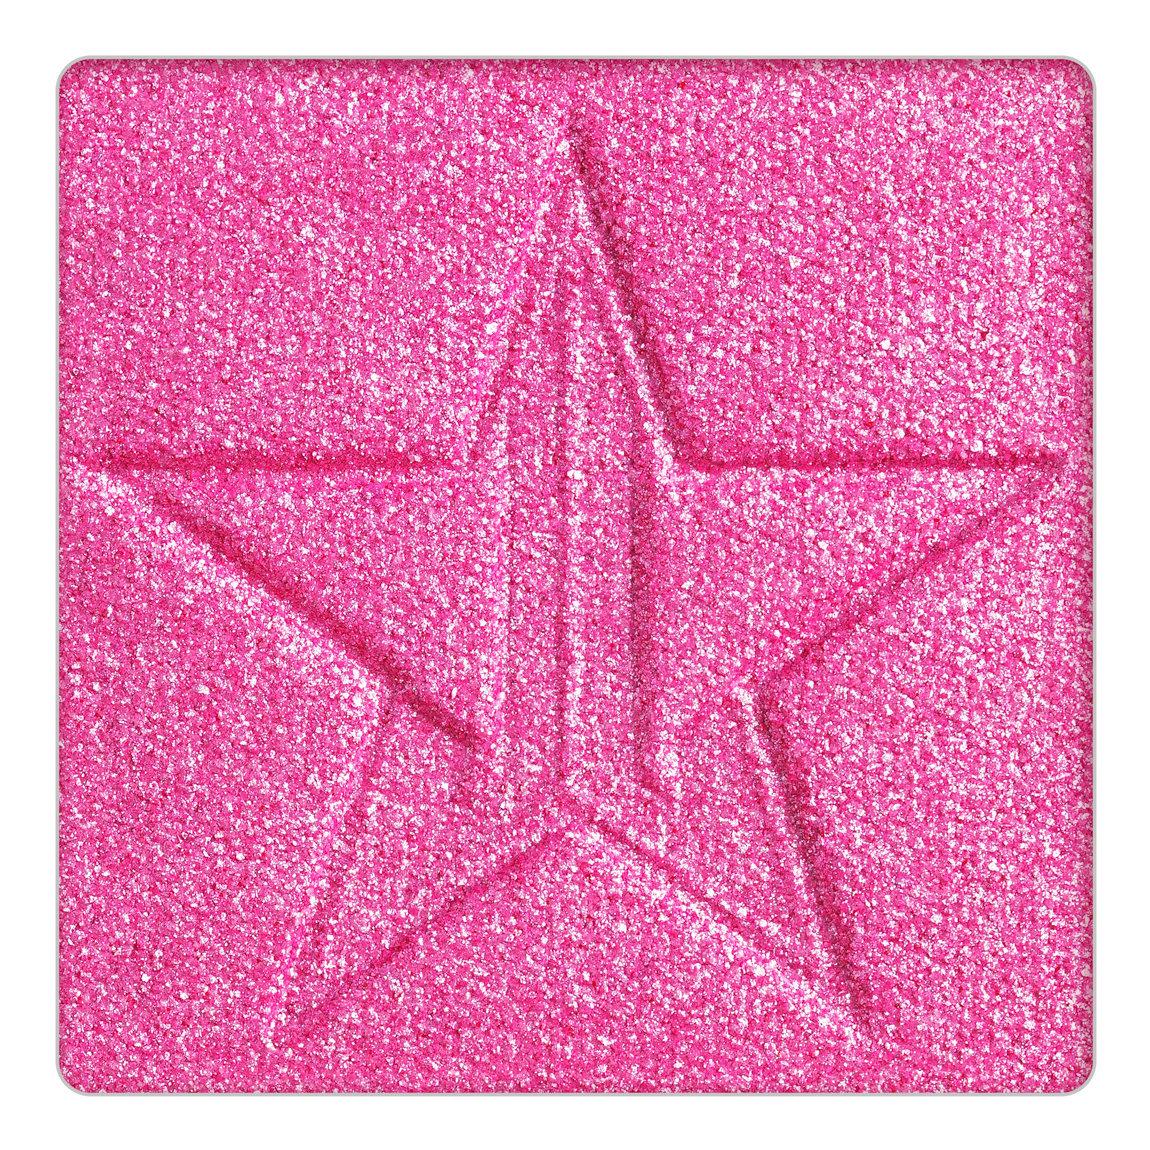 Jeffree Star Cosmetics Artistry Singles Cotton Candy alternative view 1.